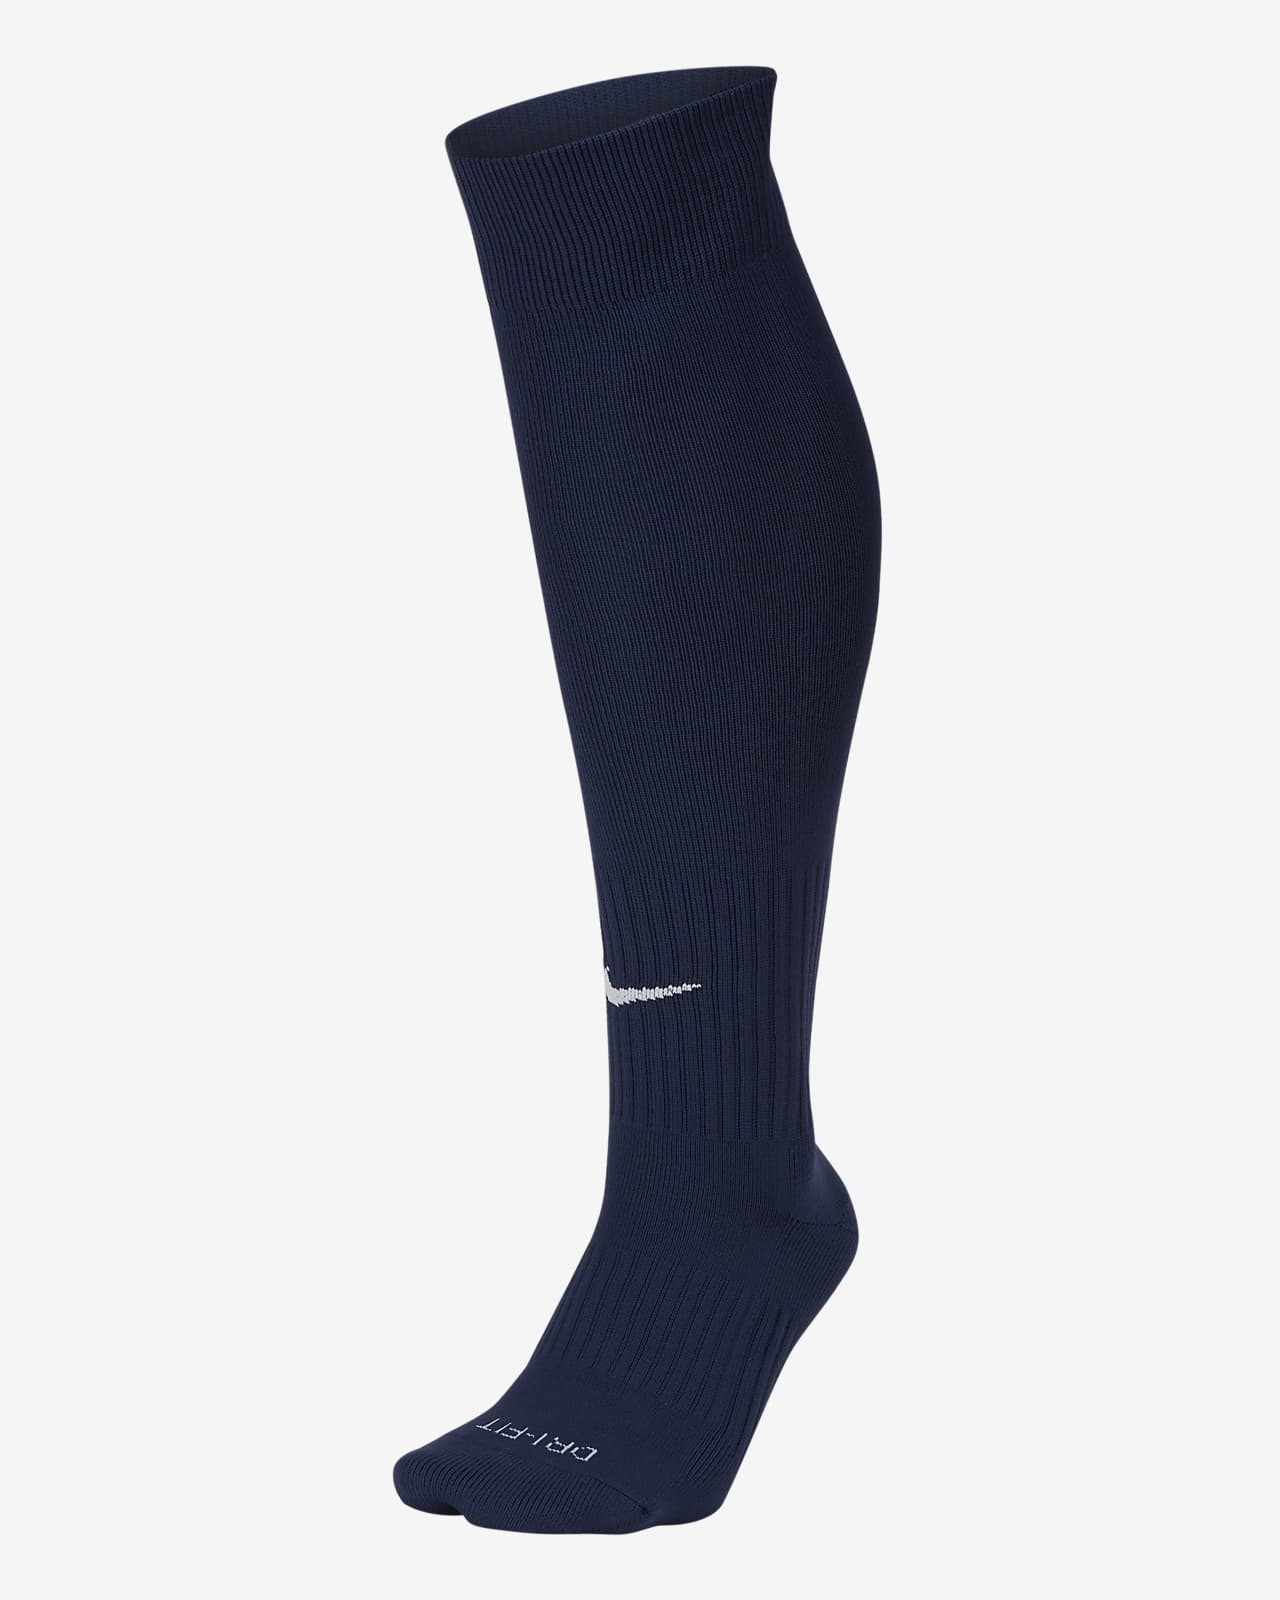 Calcetines hasta la rodilla acolchados Nike Classic 2